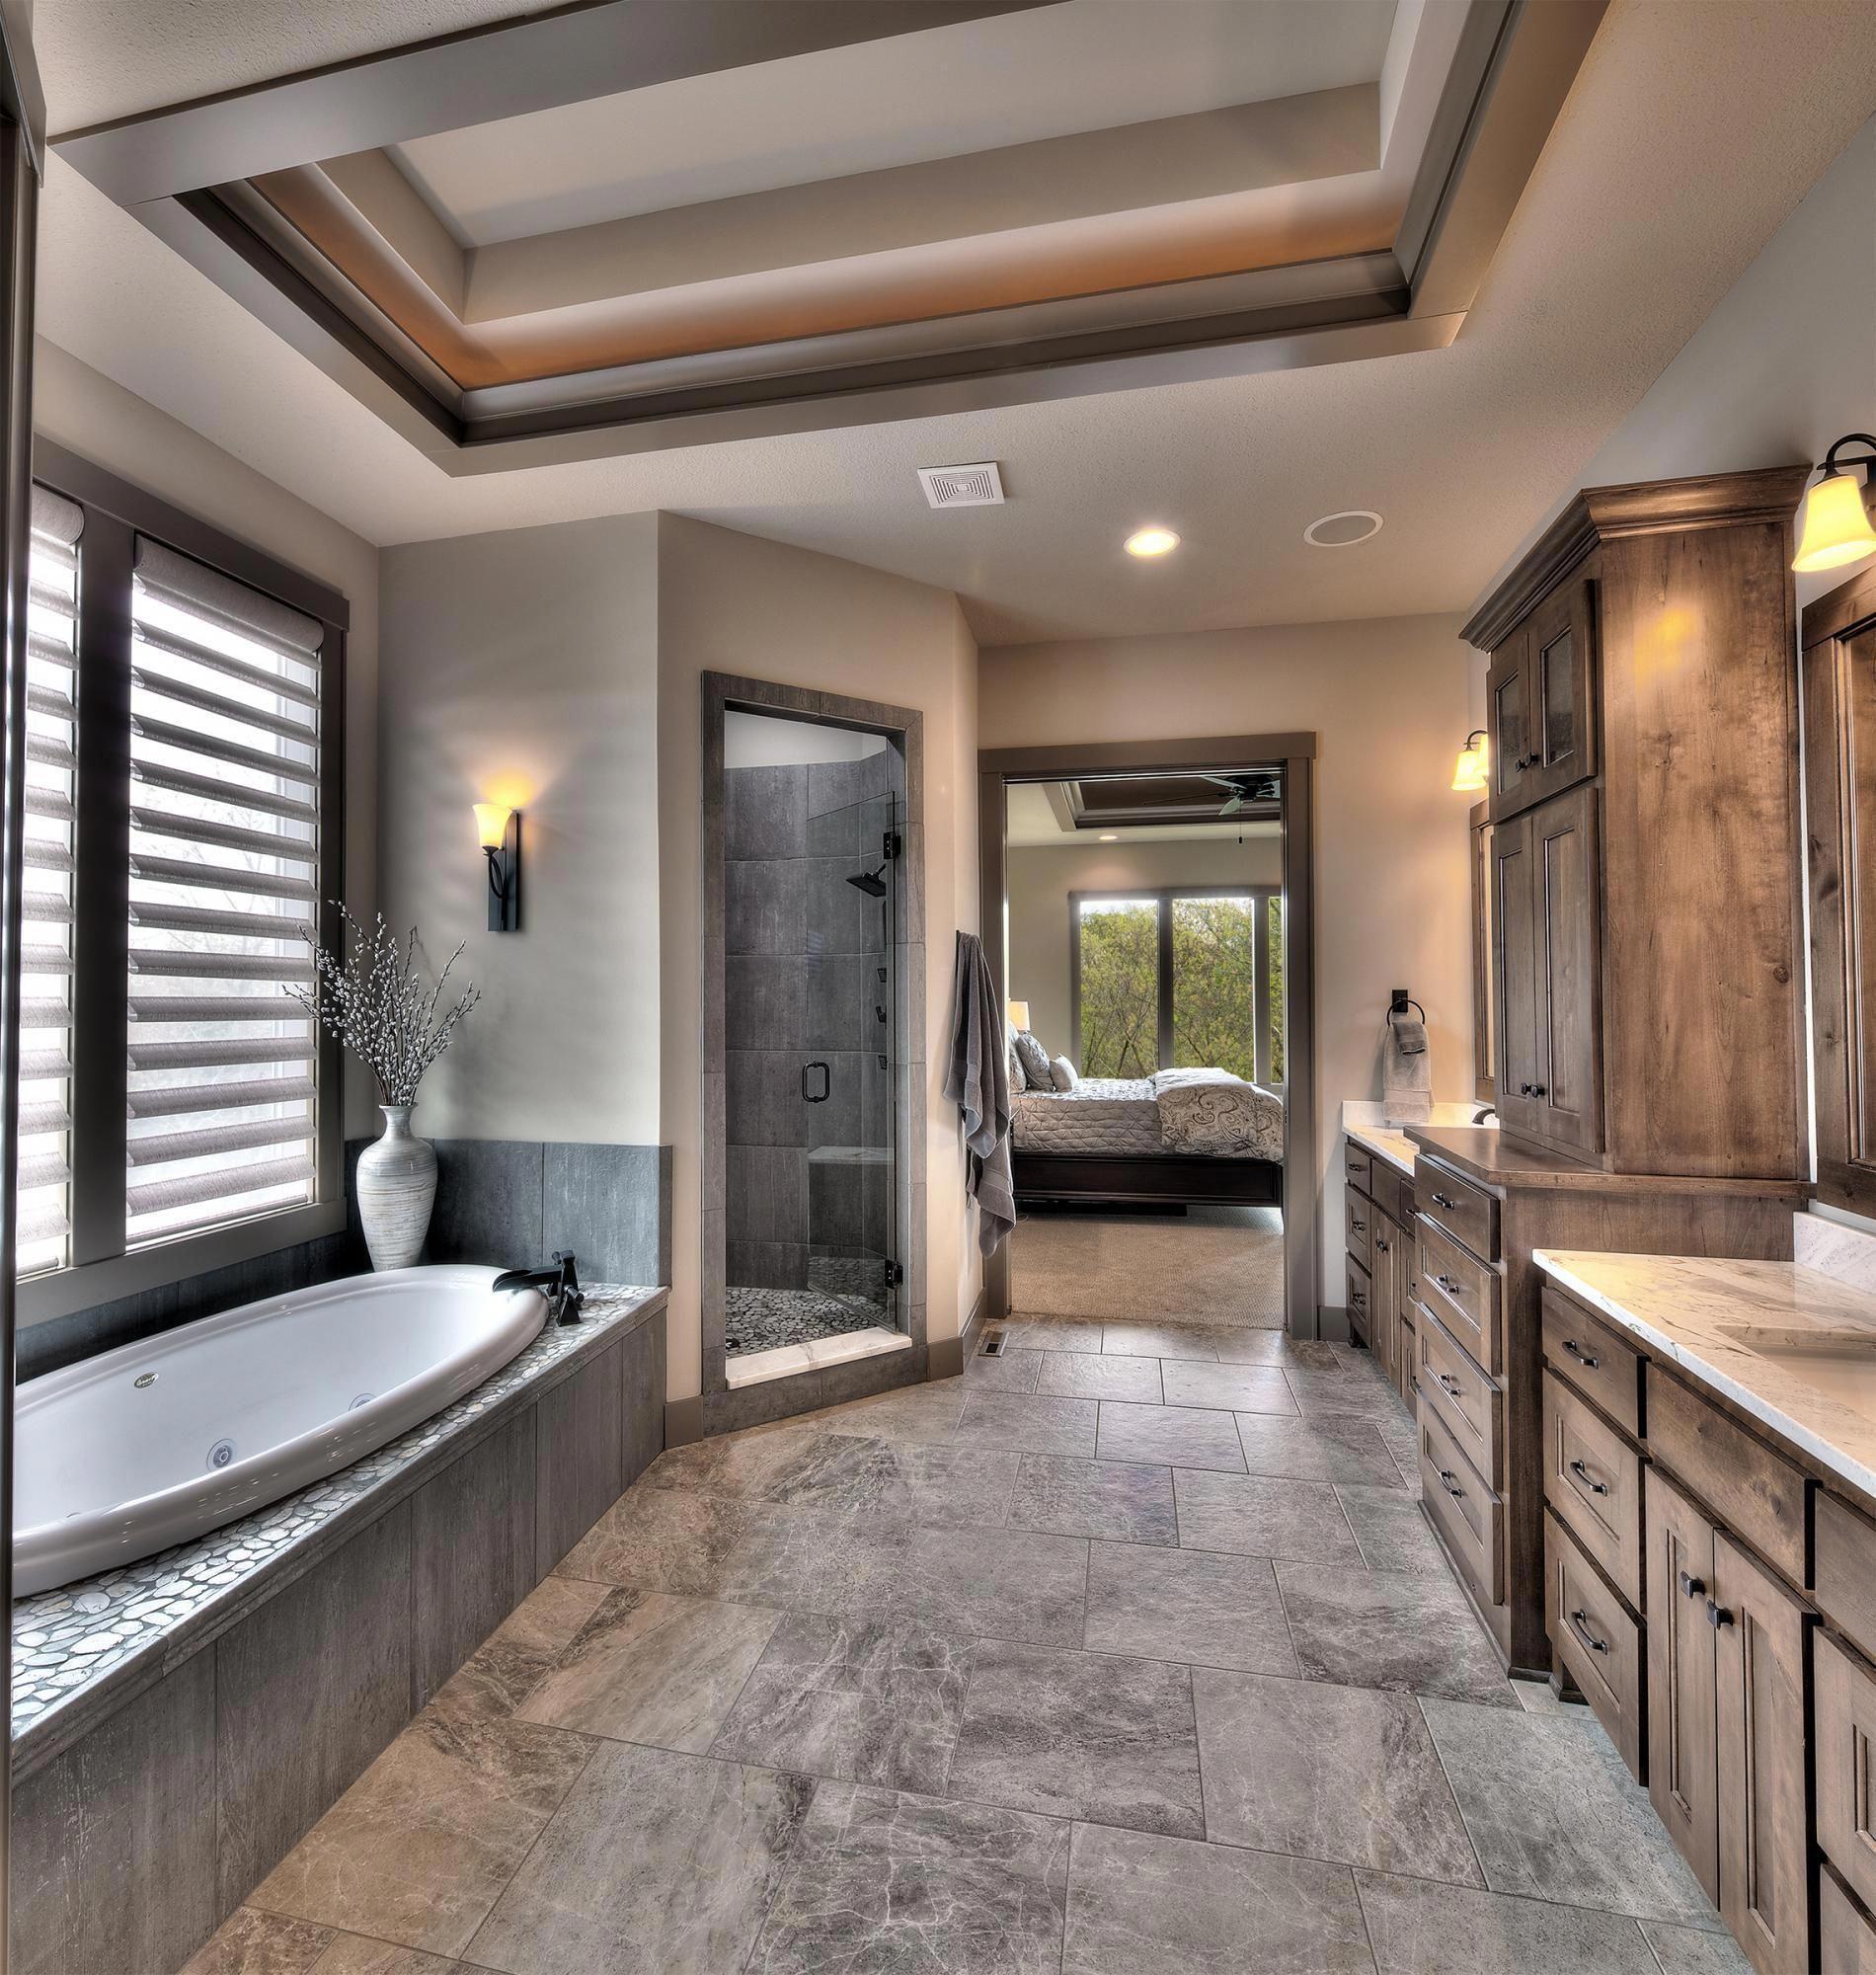 Bathrooms Photo Gallery Custom Homes In Kansas City Ks Starr Homes 28 Master Bathroom Bathroom Remodel Master Master Bathroom Design Small Bathroom Remodel [ jpg ]